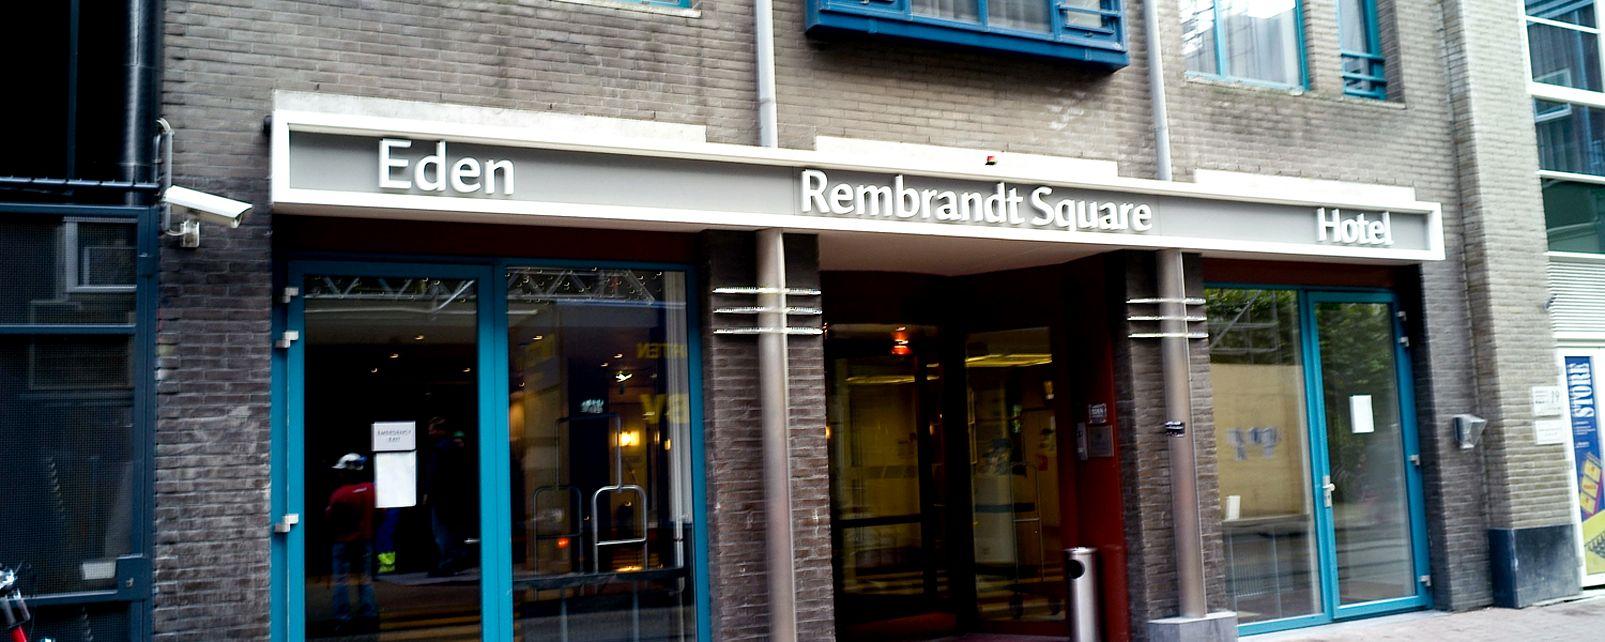 Hotel Eden Rembrandt Square Hotel